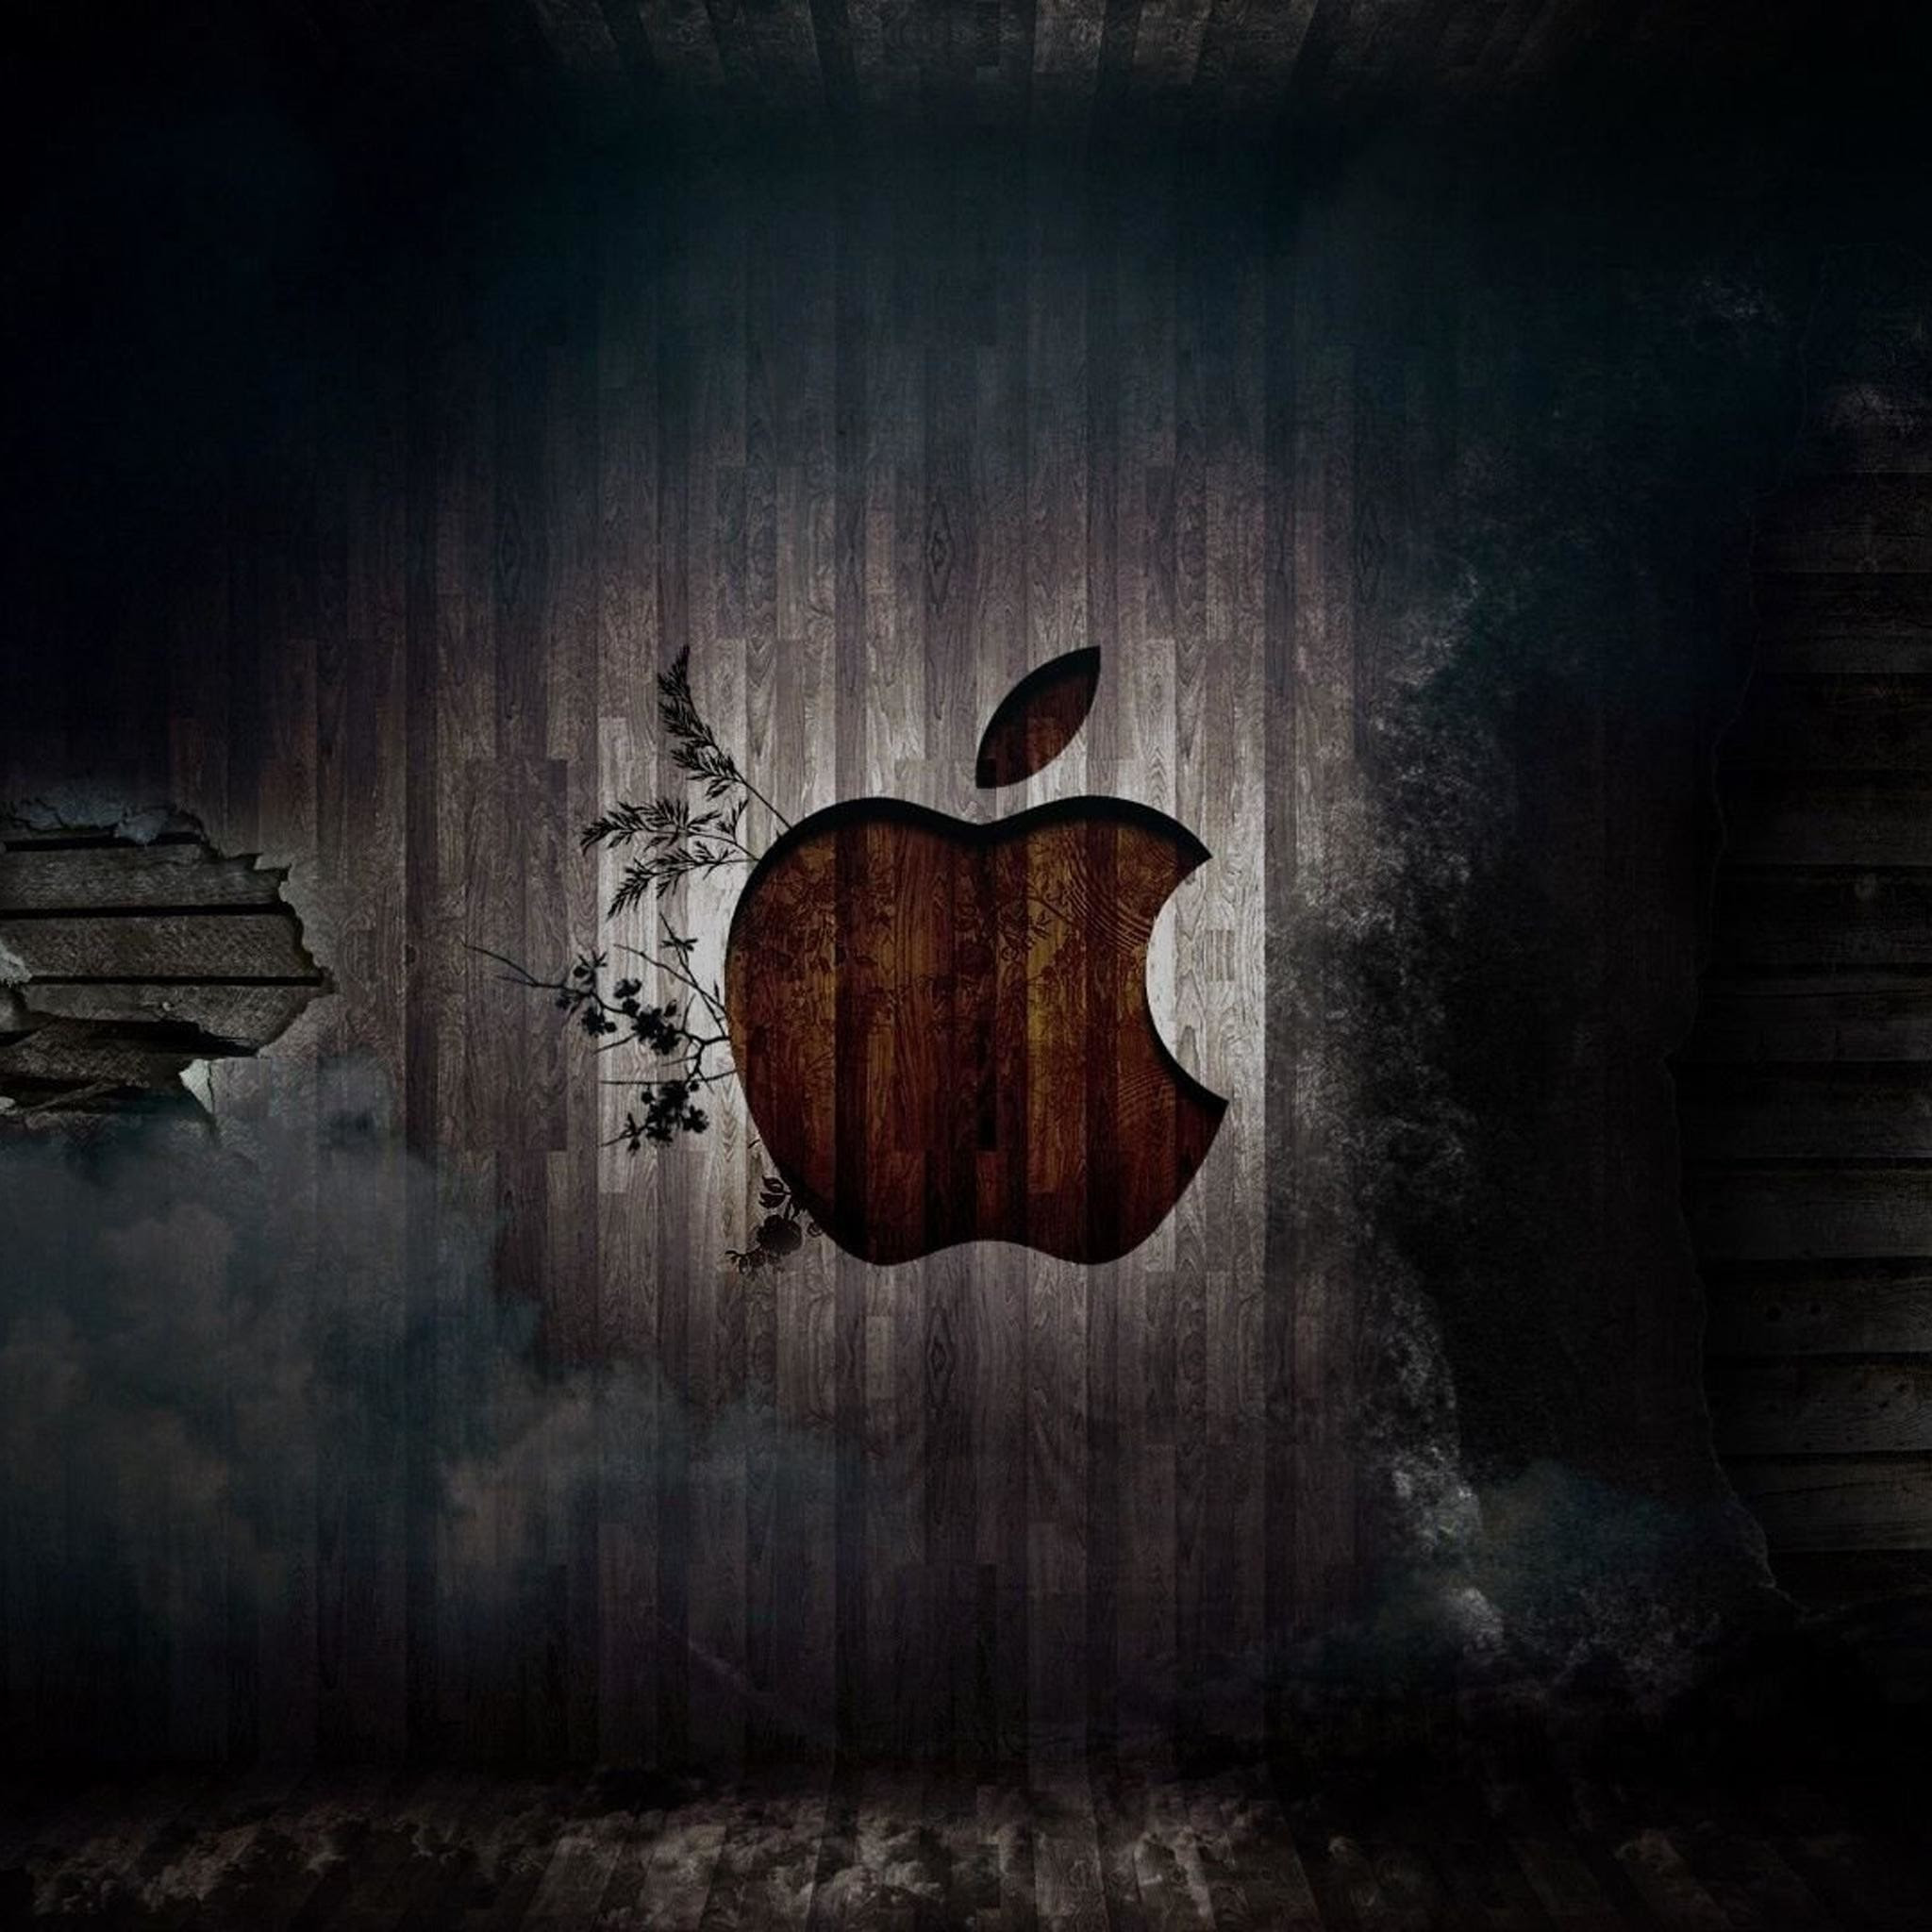 Unduh 800+ Wallpaper Apple Hd Iphone 7 HD Gratis